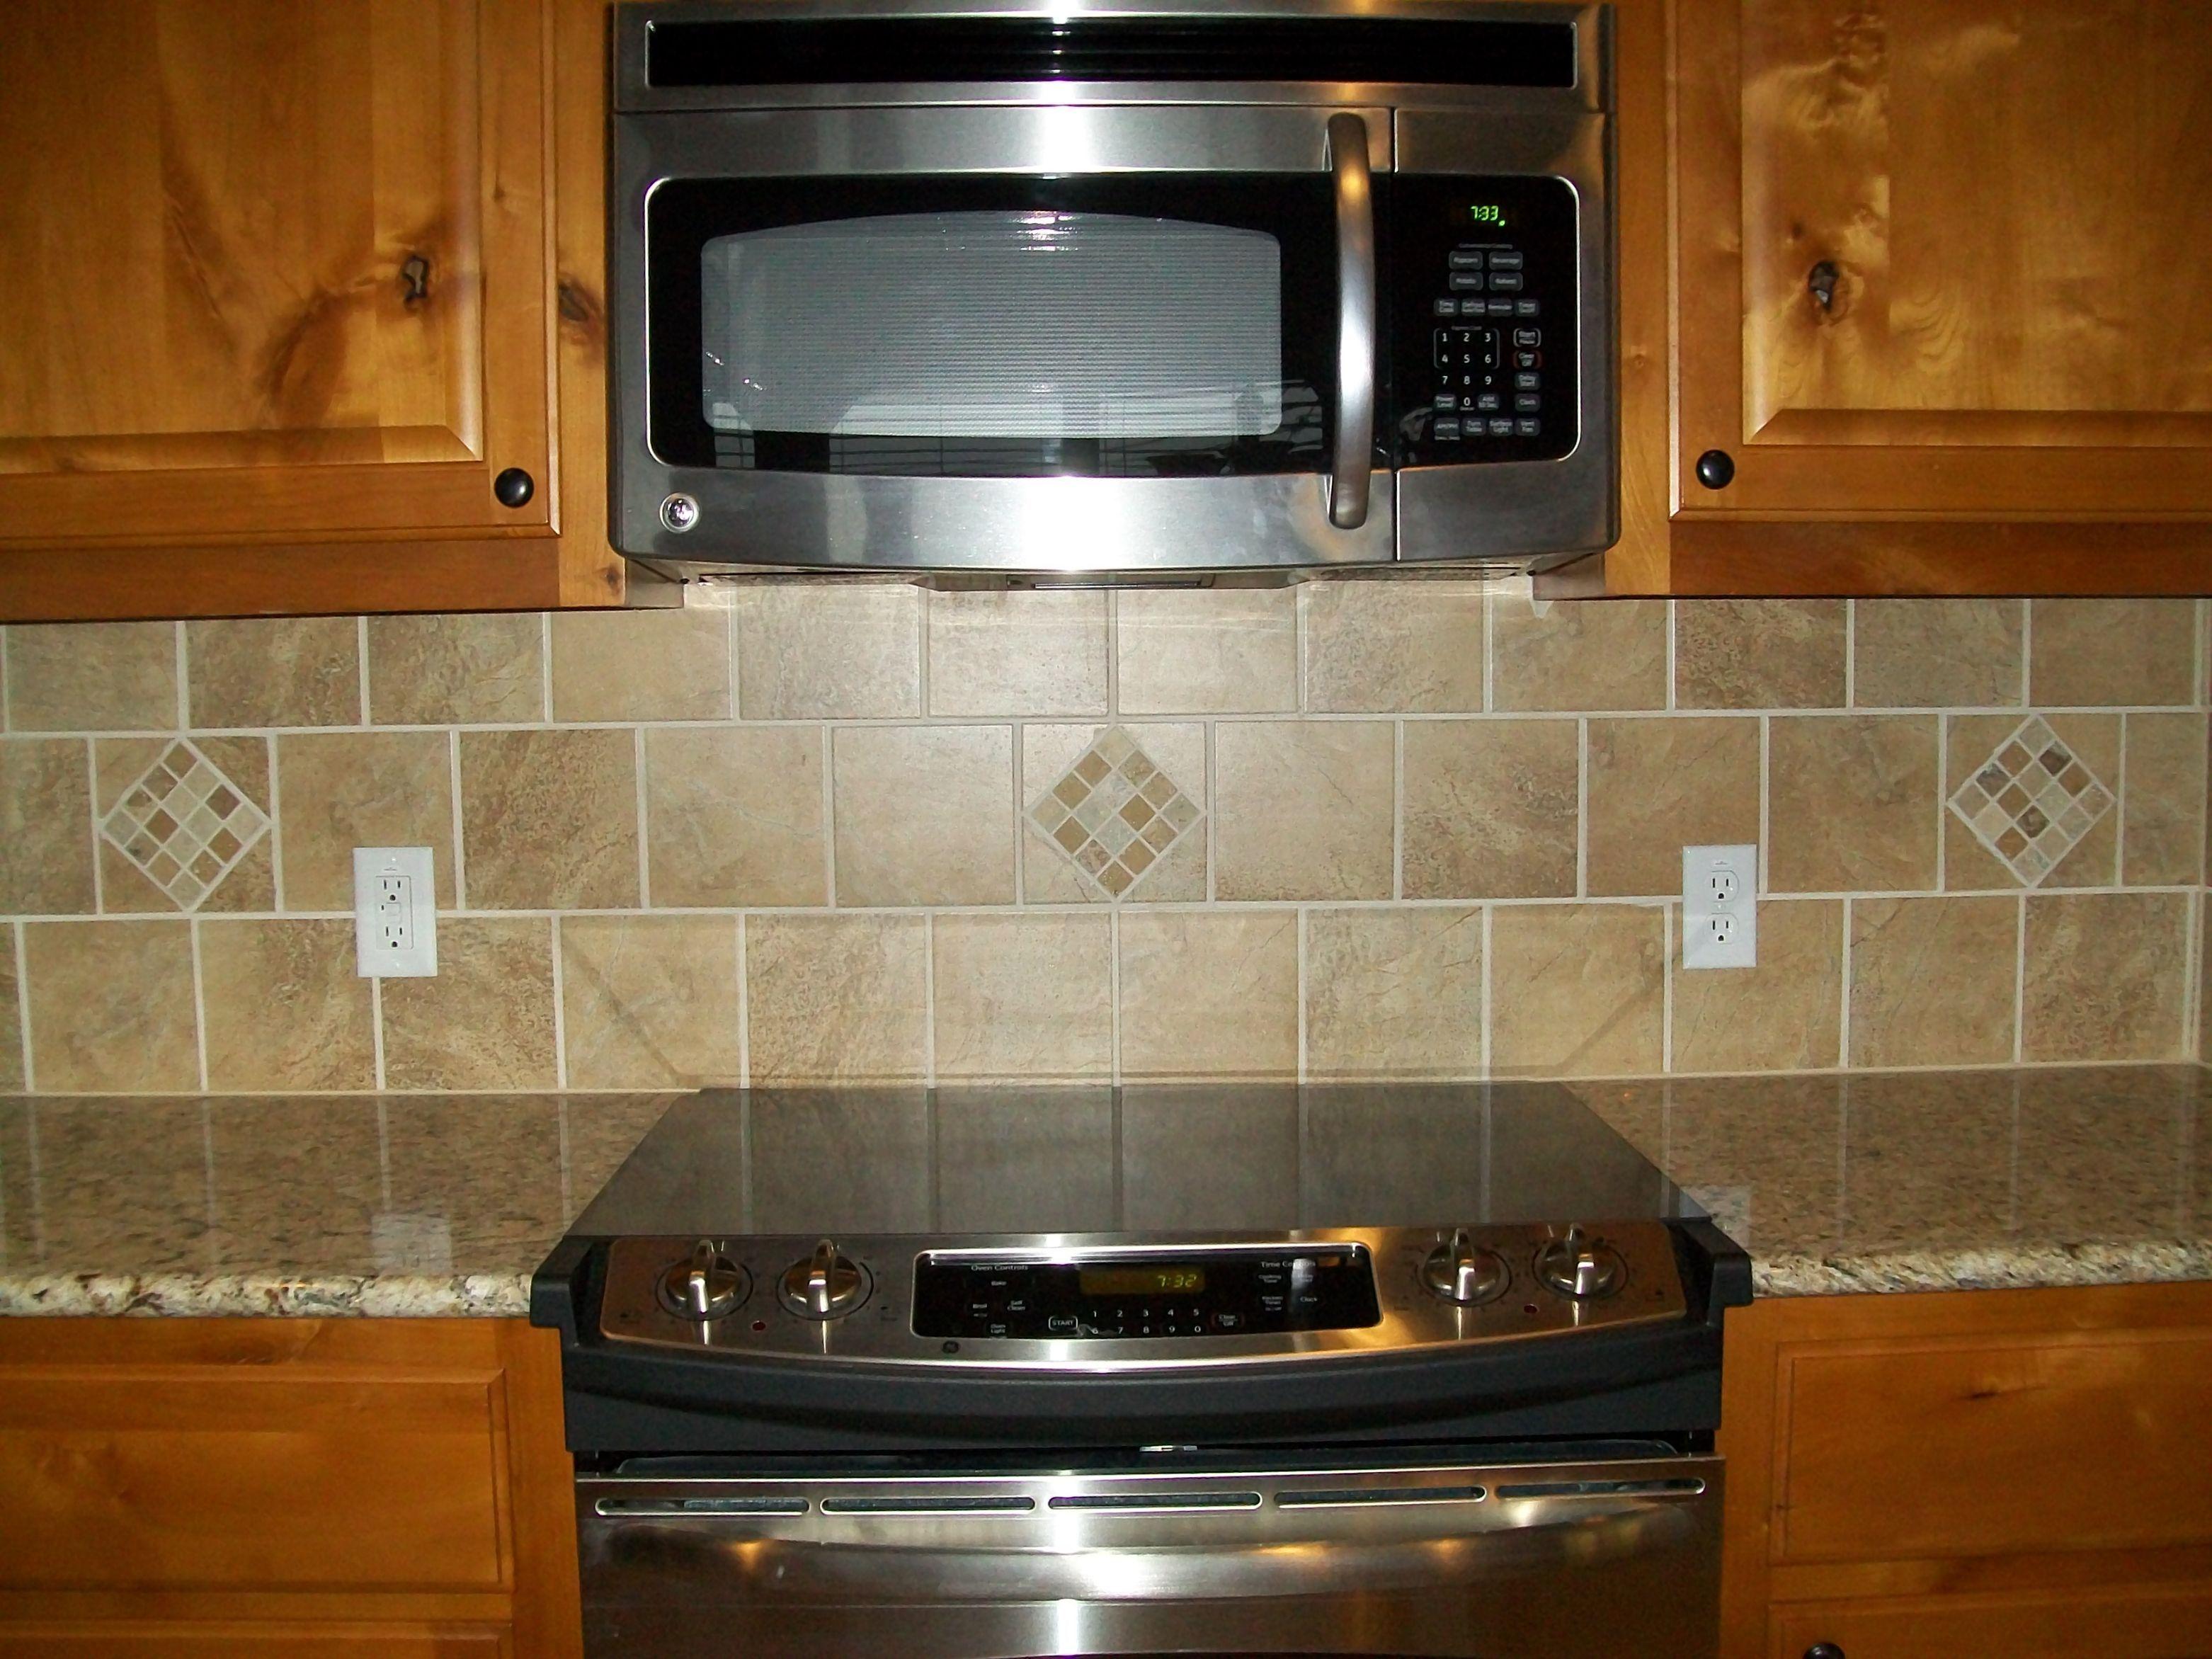 kitchen backsplash ideas Neutral Tone Traditional